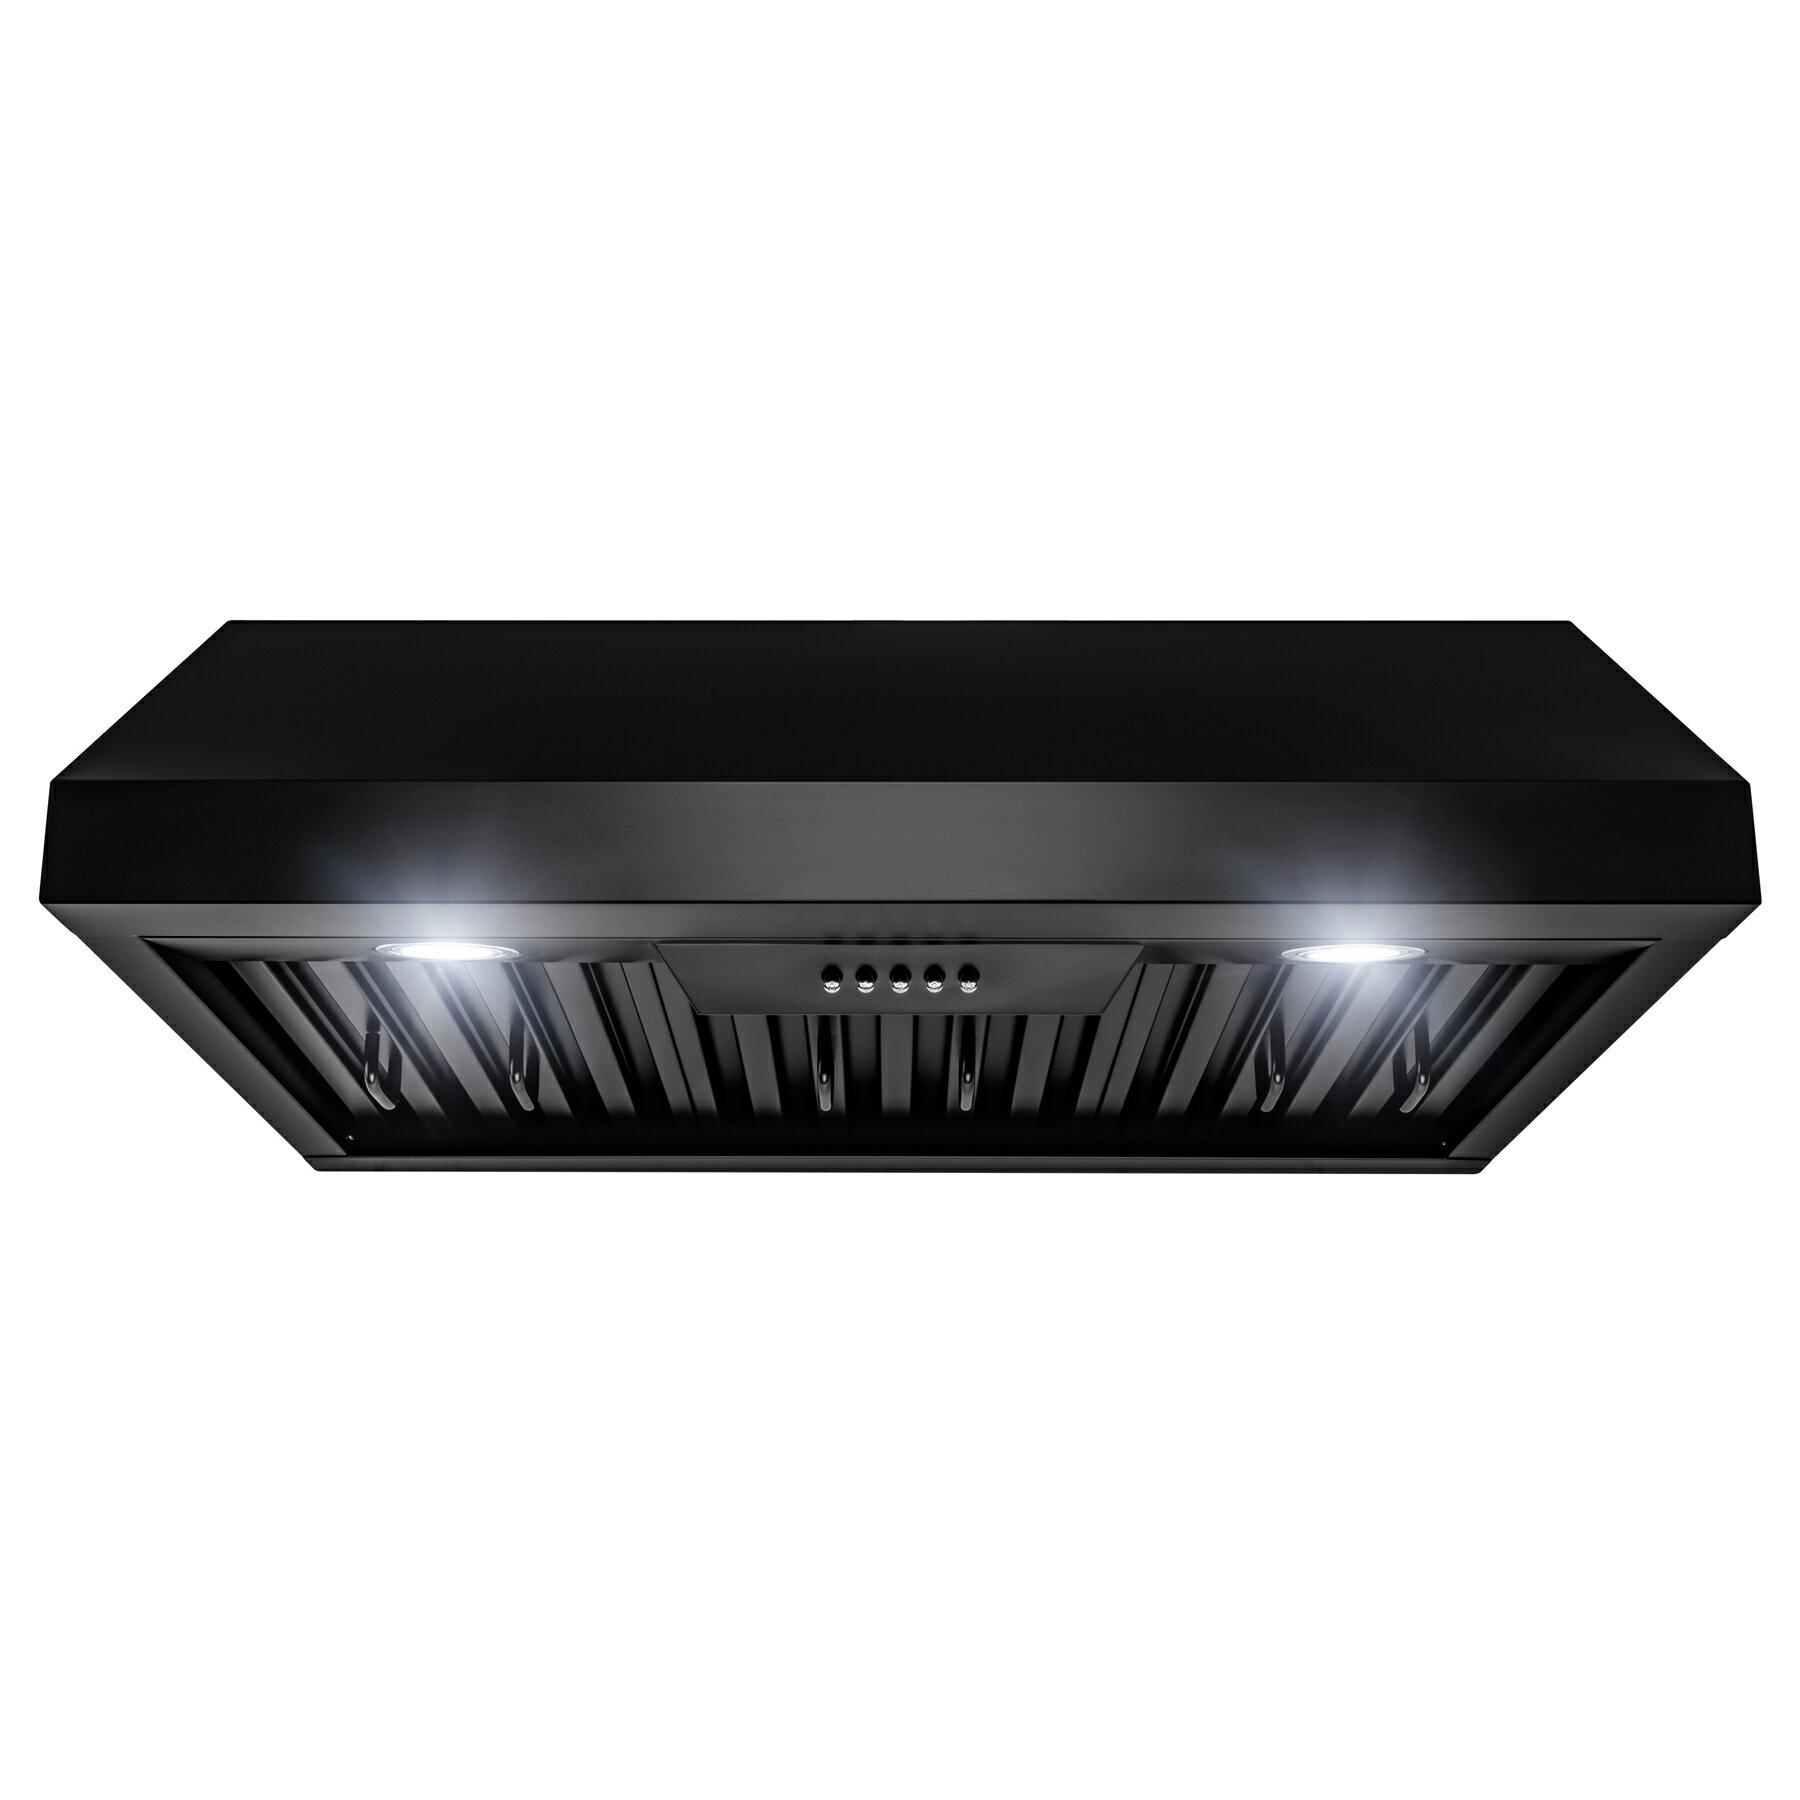 "AKDY European Style Range Hood – Stainless Steel 30"" Hood Filter – Premium  Kitchen Exhaust Fan – Under Cabinet Range Hood – Matte Black Painted Finish  ..."